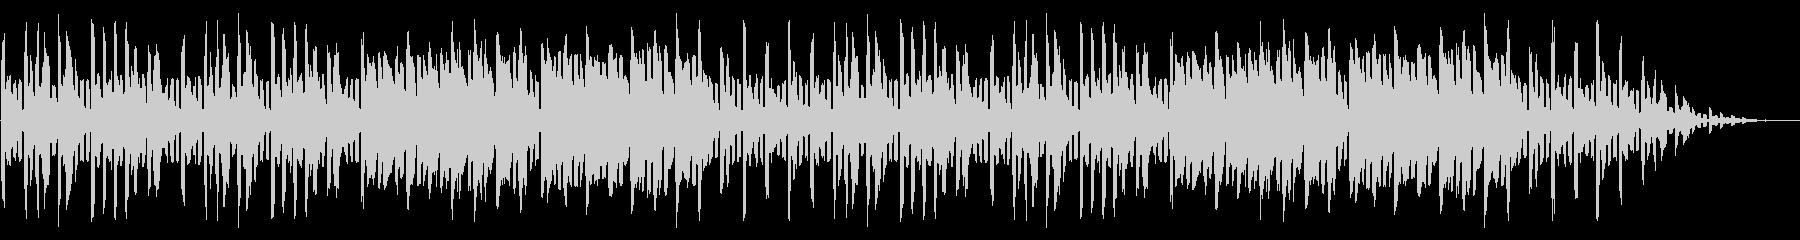 GB風シューティングのエンディング曲の未再生の波形